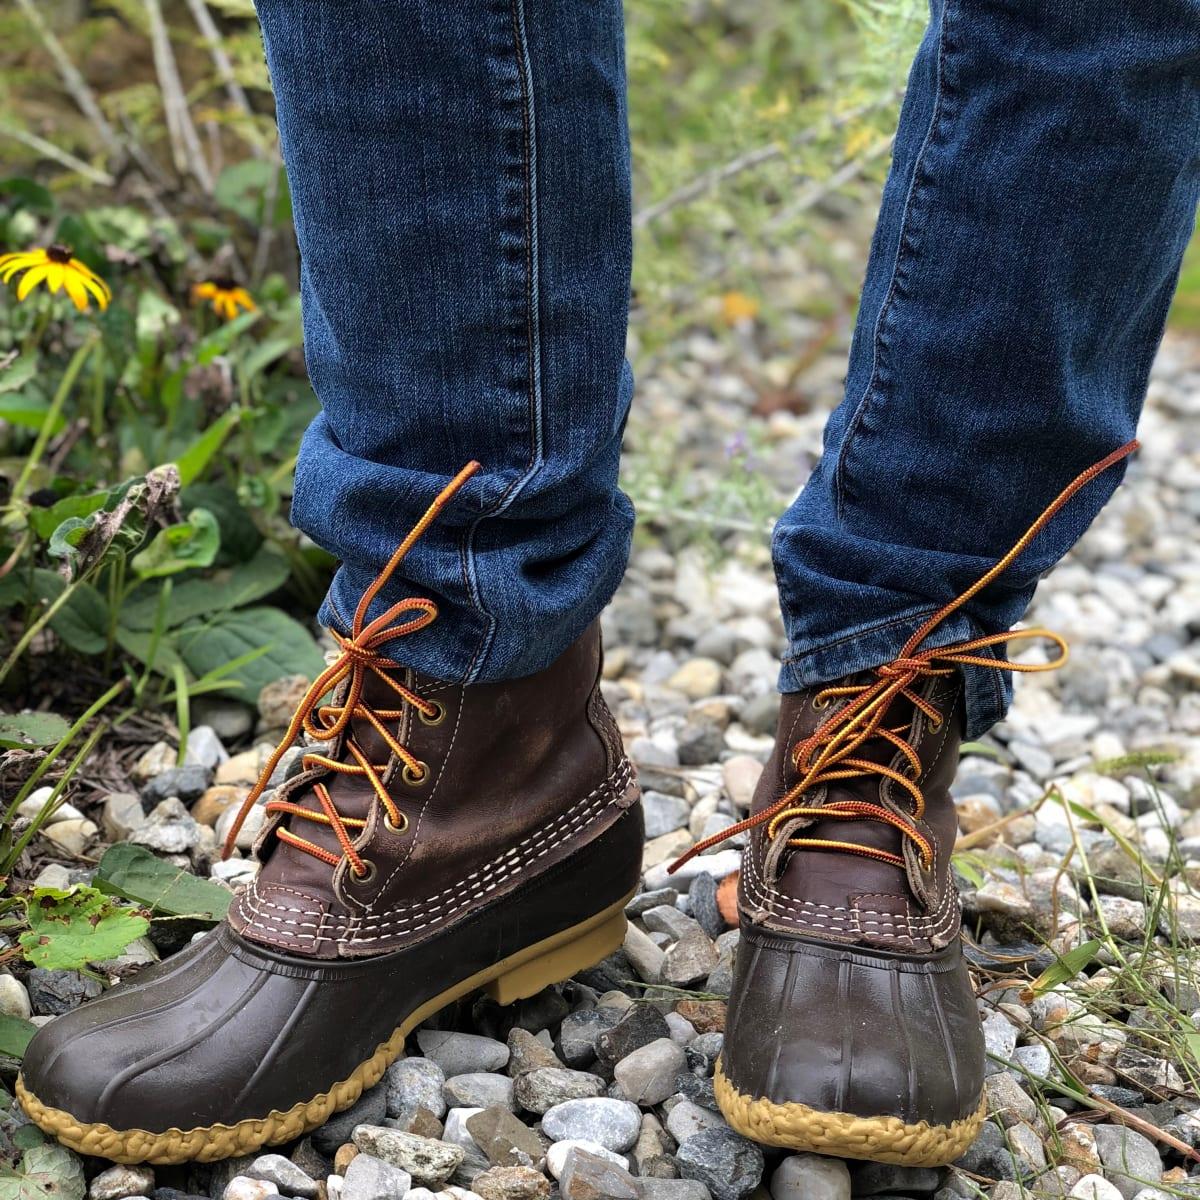 Resoling L.L.Bean Boots - MomTrends